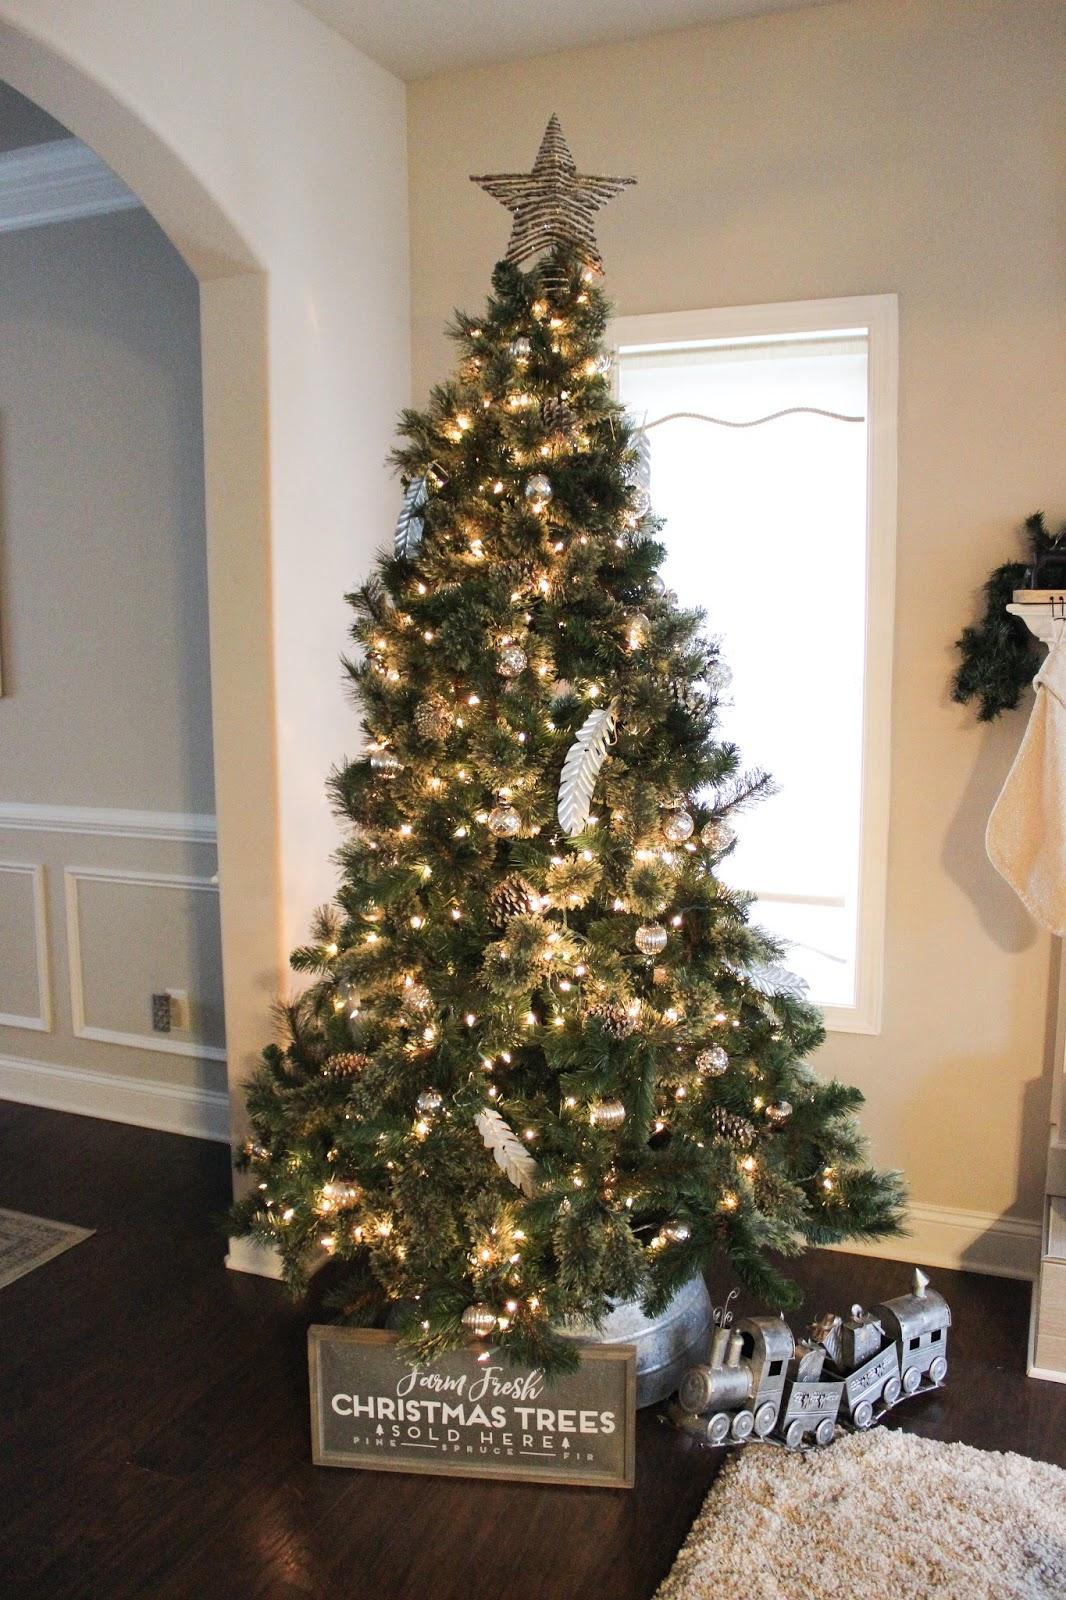 Tree Details Christmas Faux Virginia Pine Target Tin Skirt Crate Barrel Star Train Similar To Hayneedle